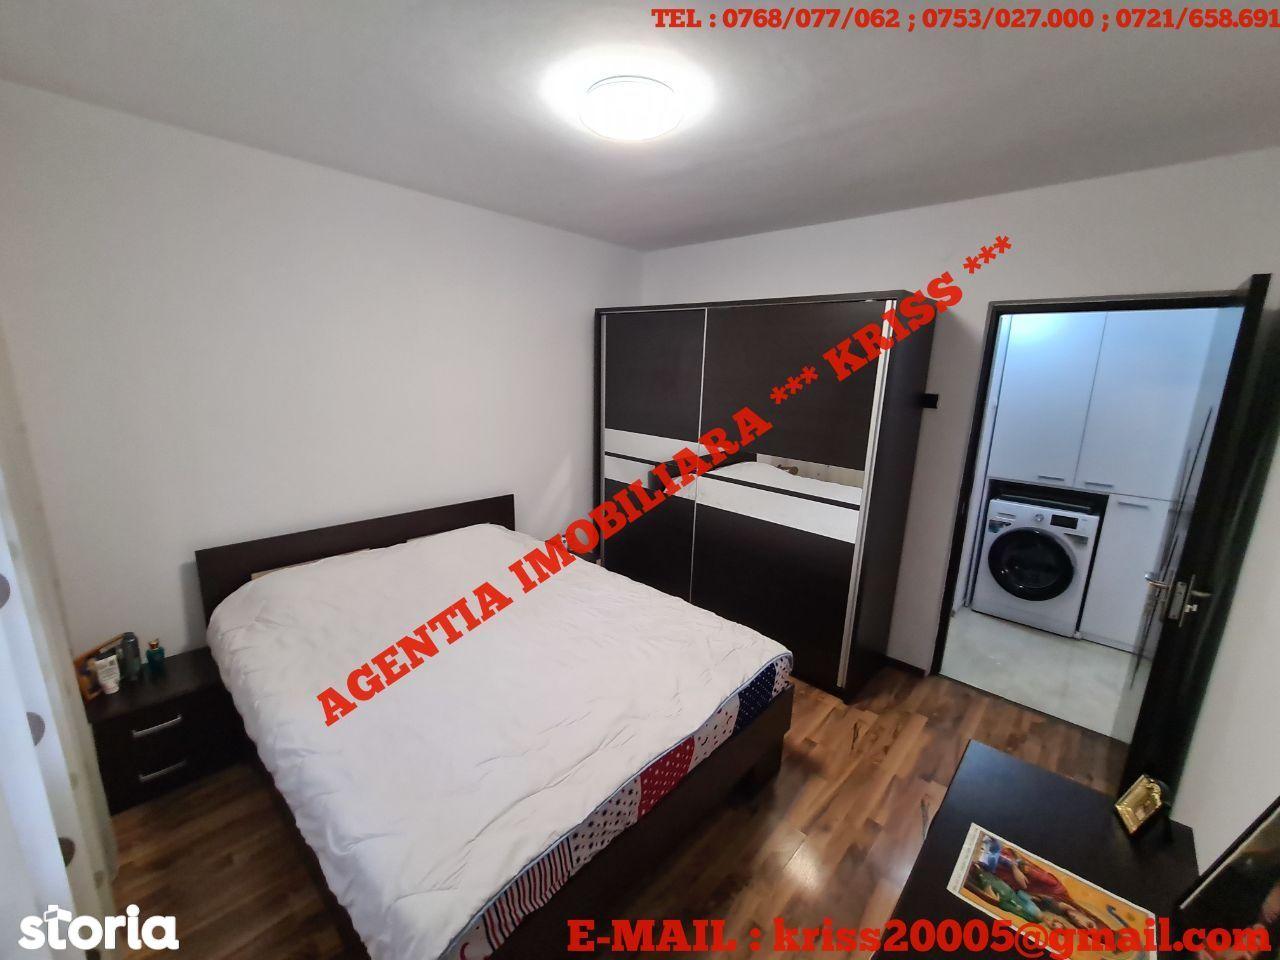 APARTAMENT 2 Camere CRAIOVEI Confort 1 Mobilat Și Utilat Centrală